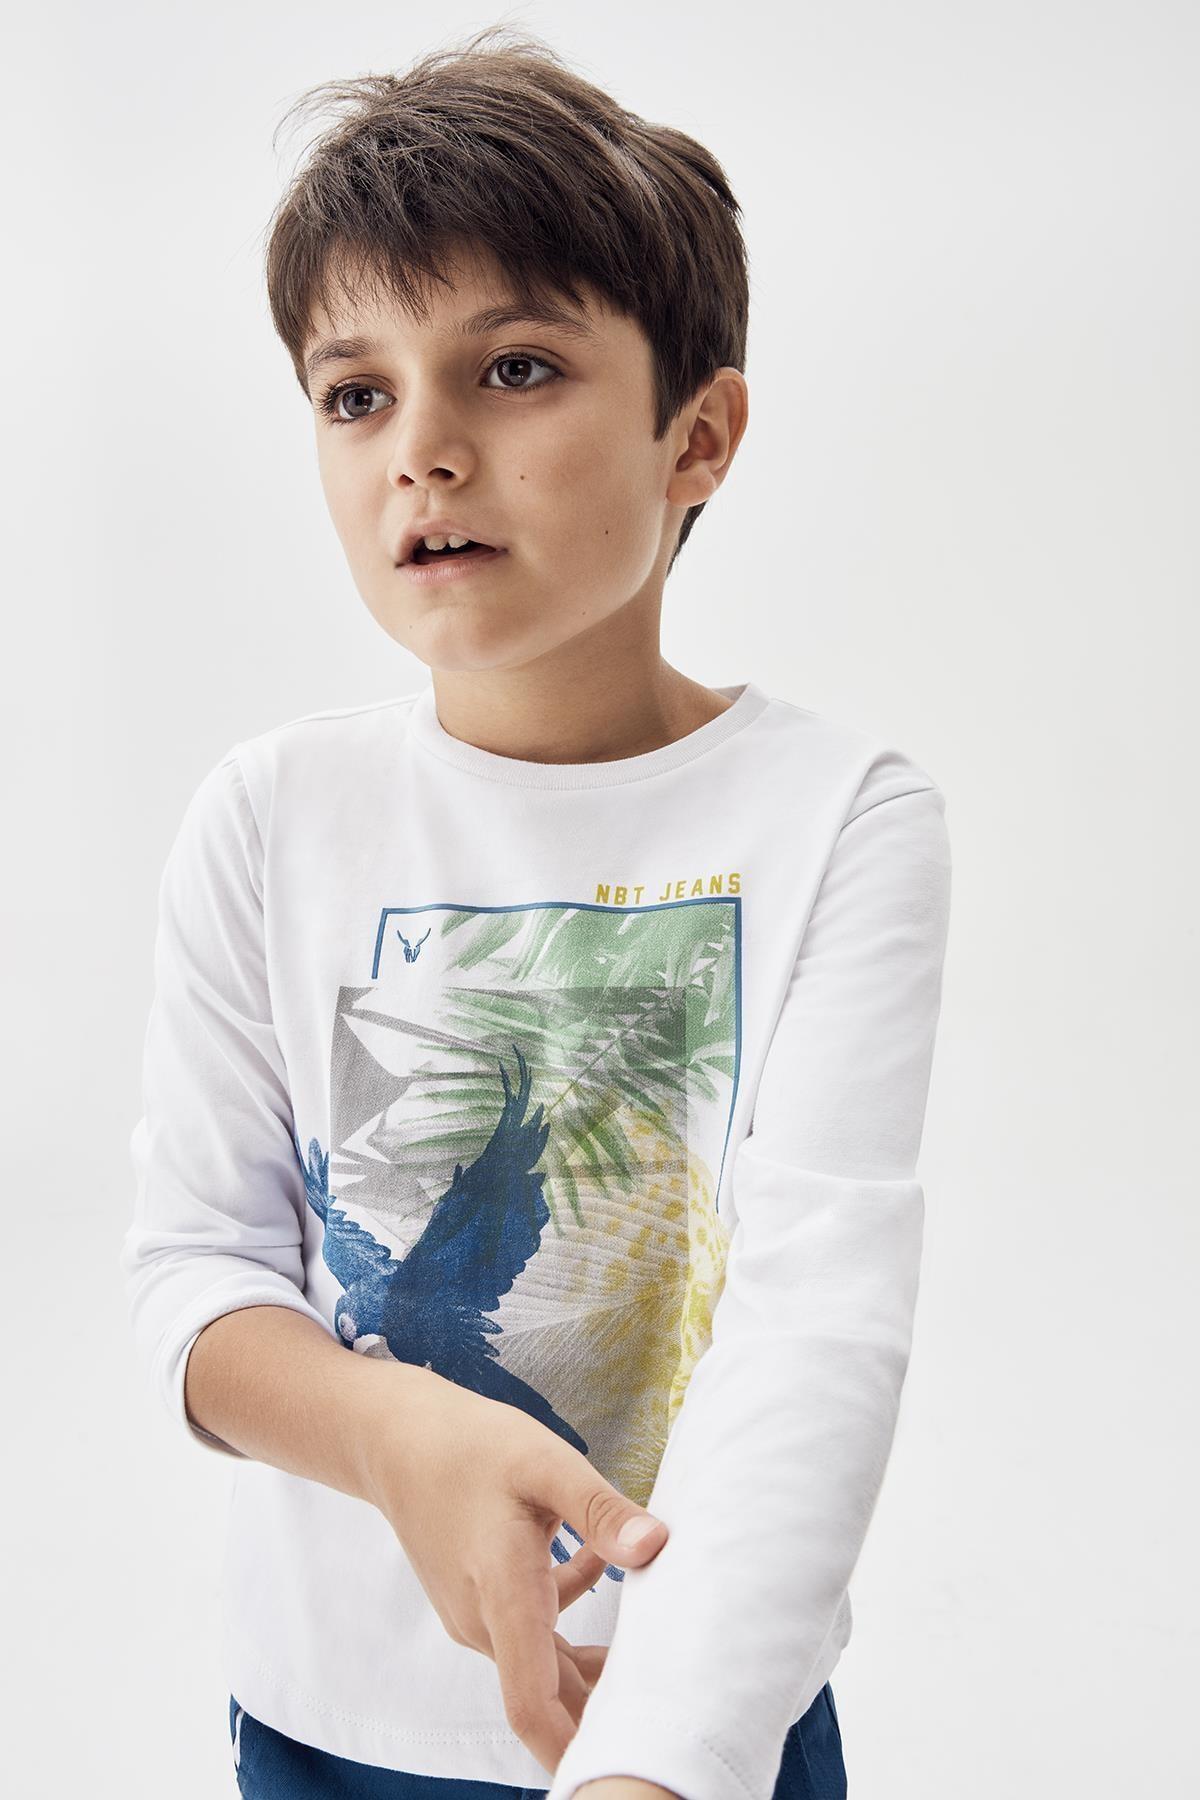 Nebbati Erkek Çocuk Beyaz T-shirt 20fw0nb3509 1